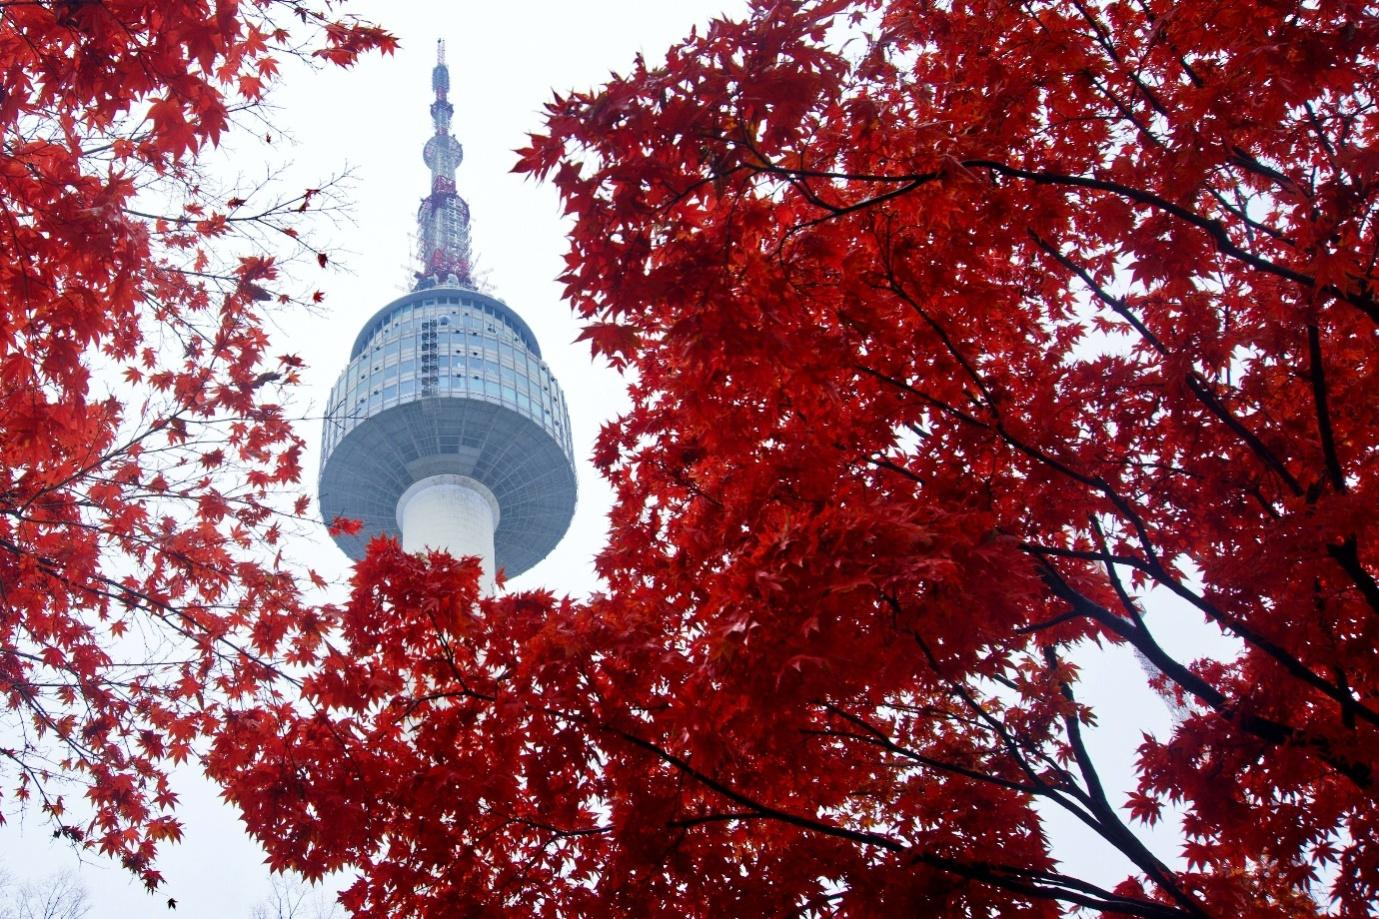 Reasons to visit Seoul